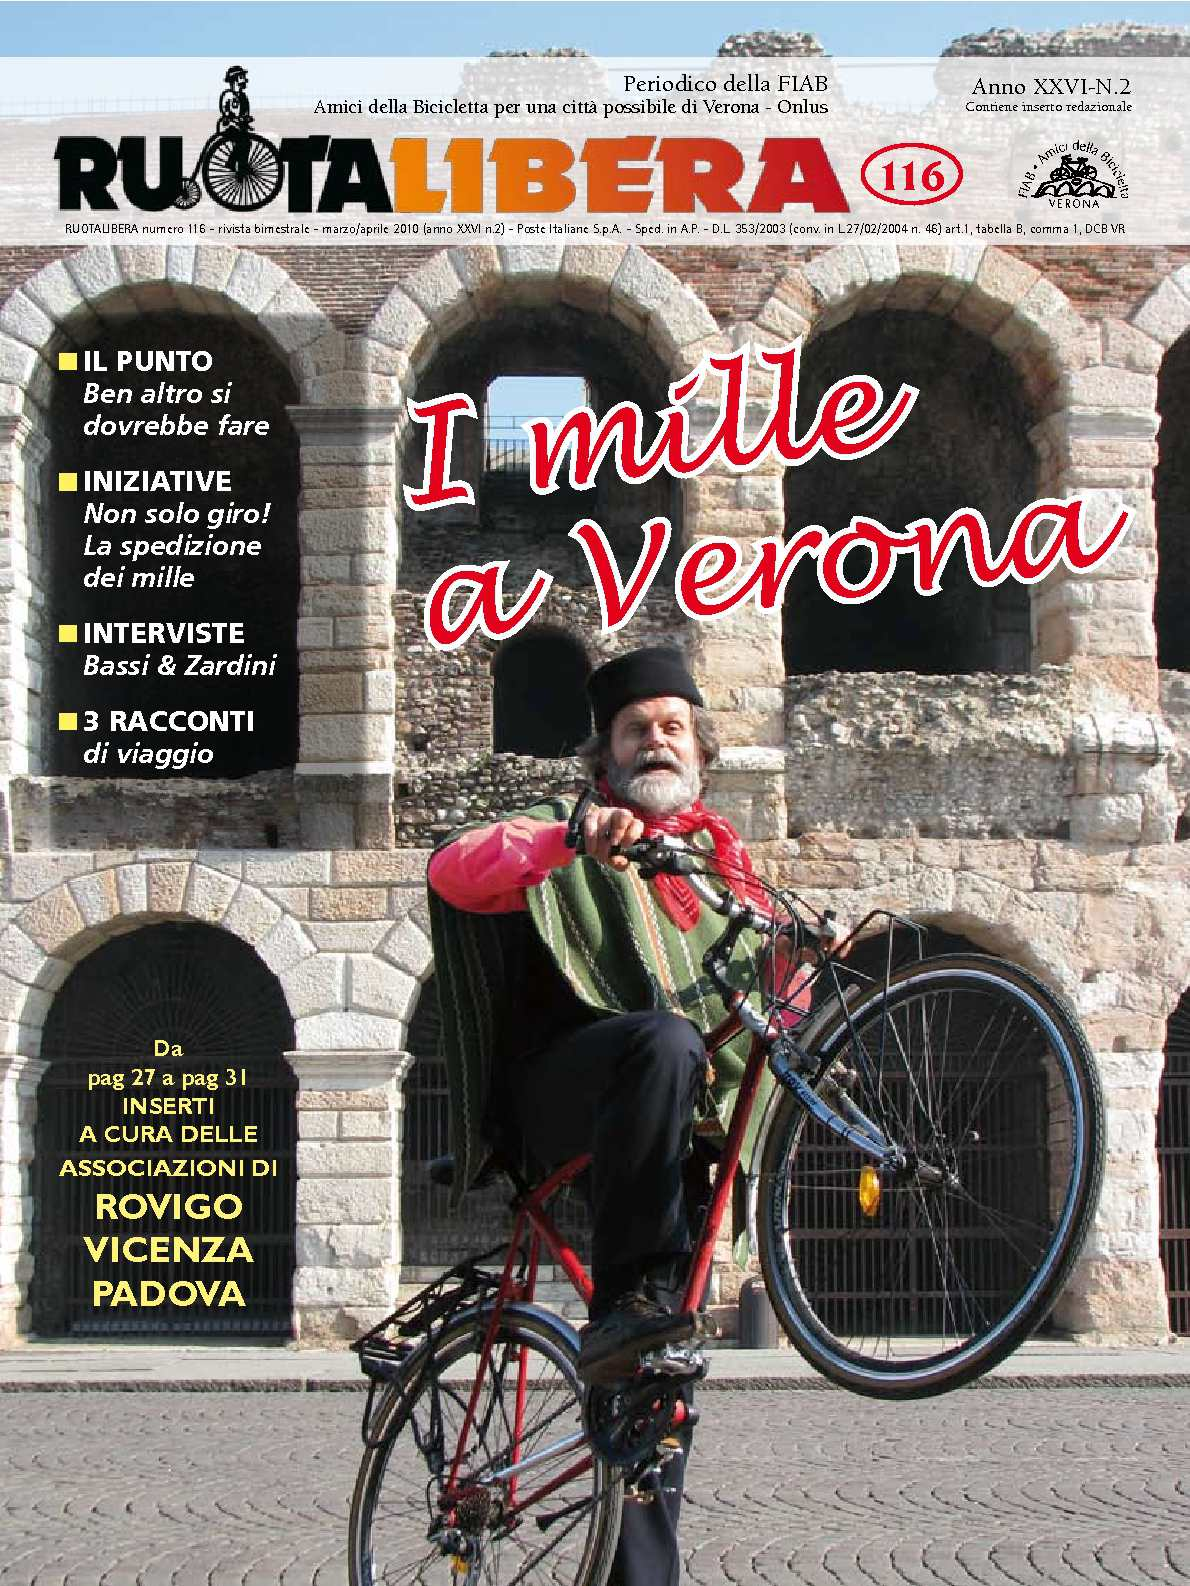 Ruotalibera 116 (marzo/aprile 2010) - FIAB AdB Verona